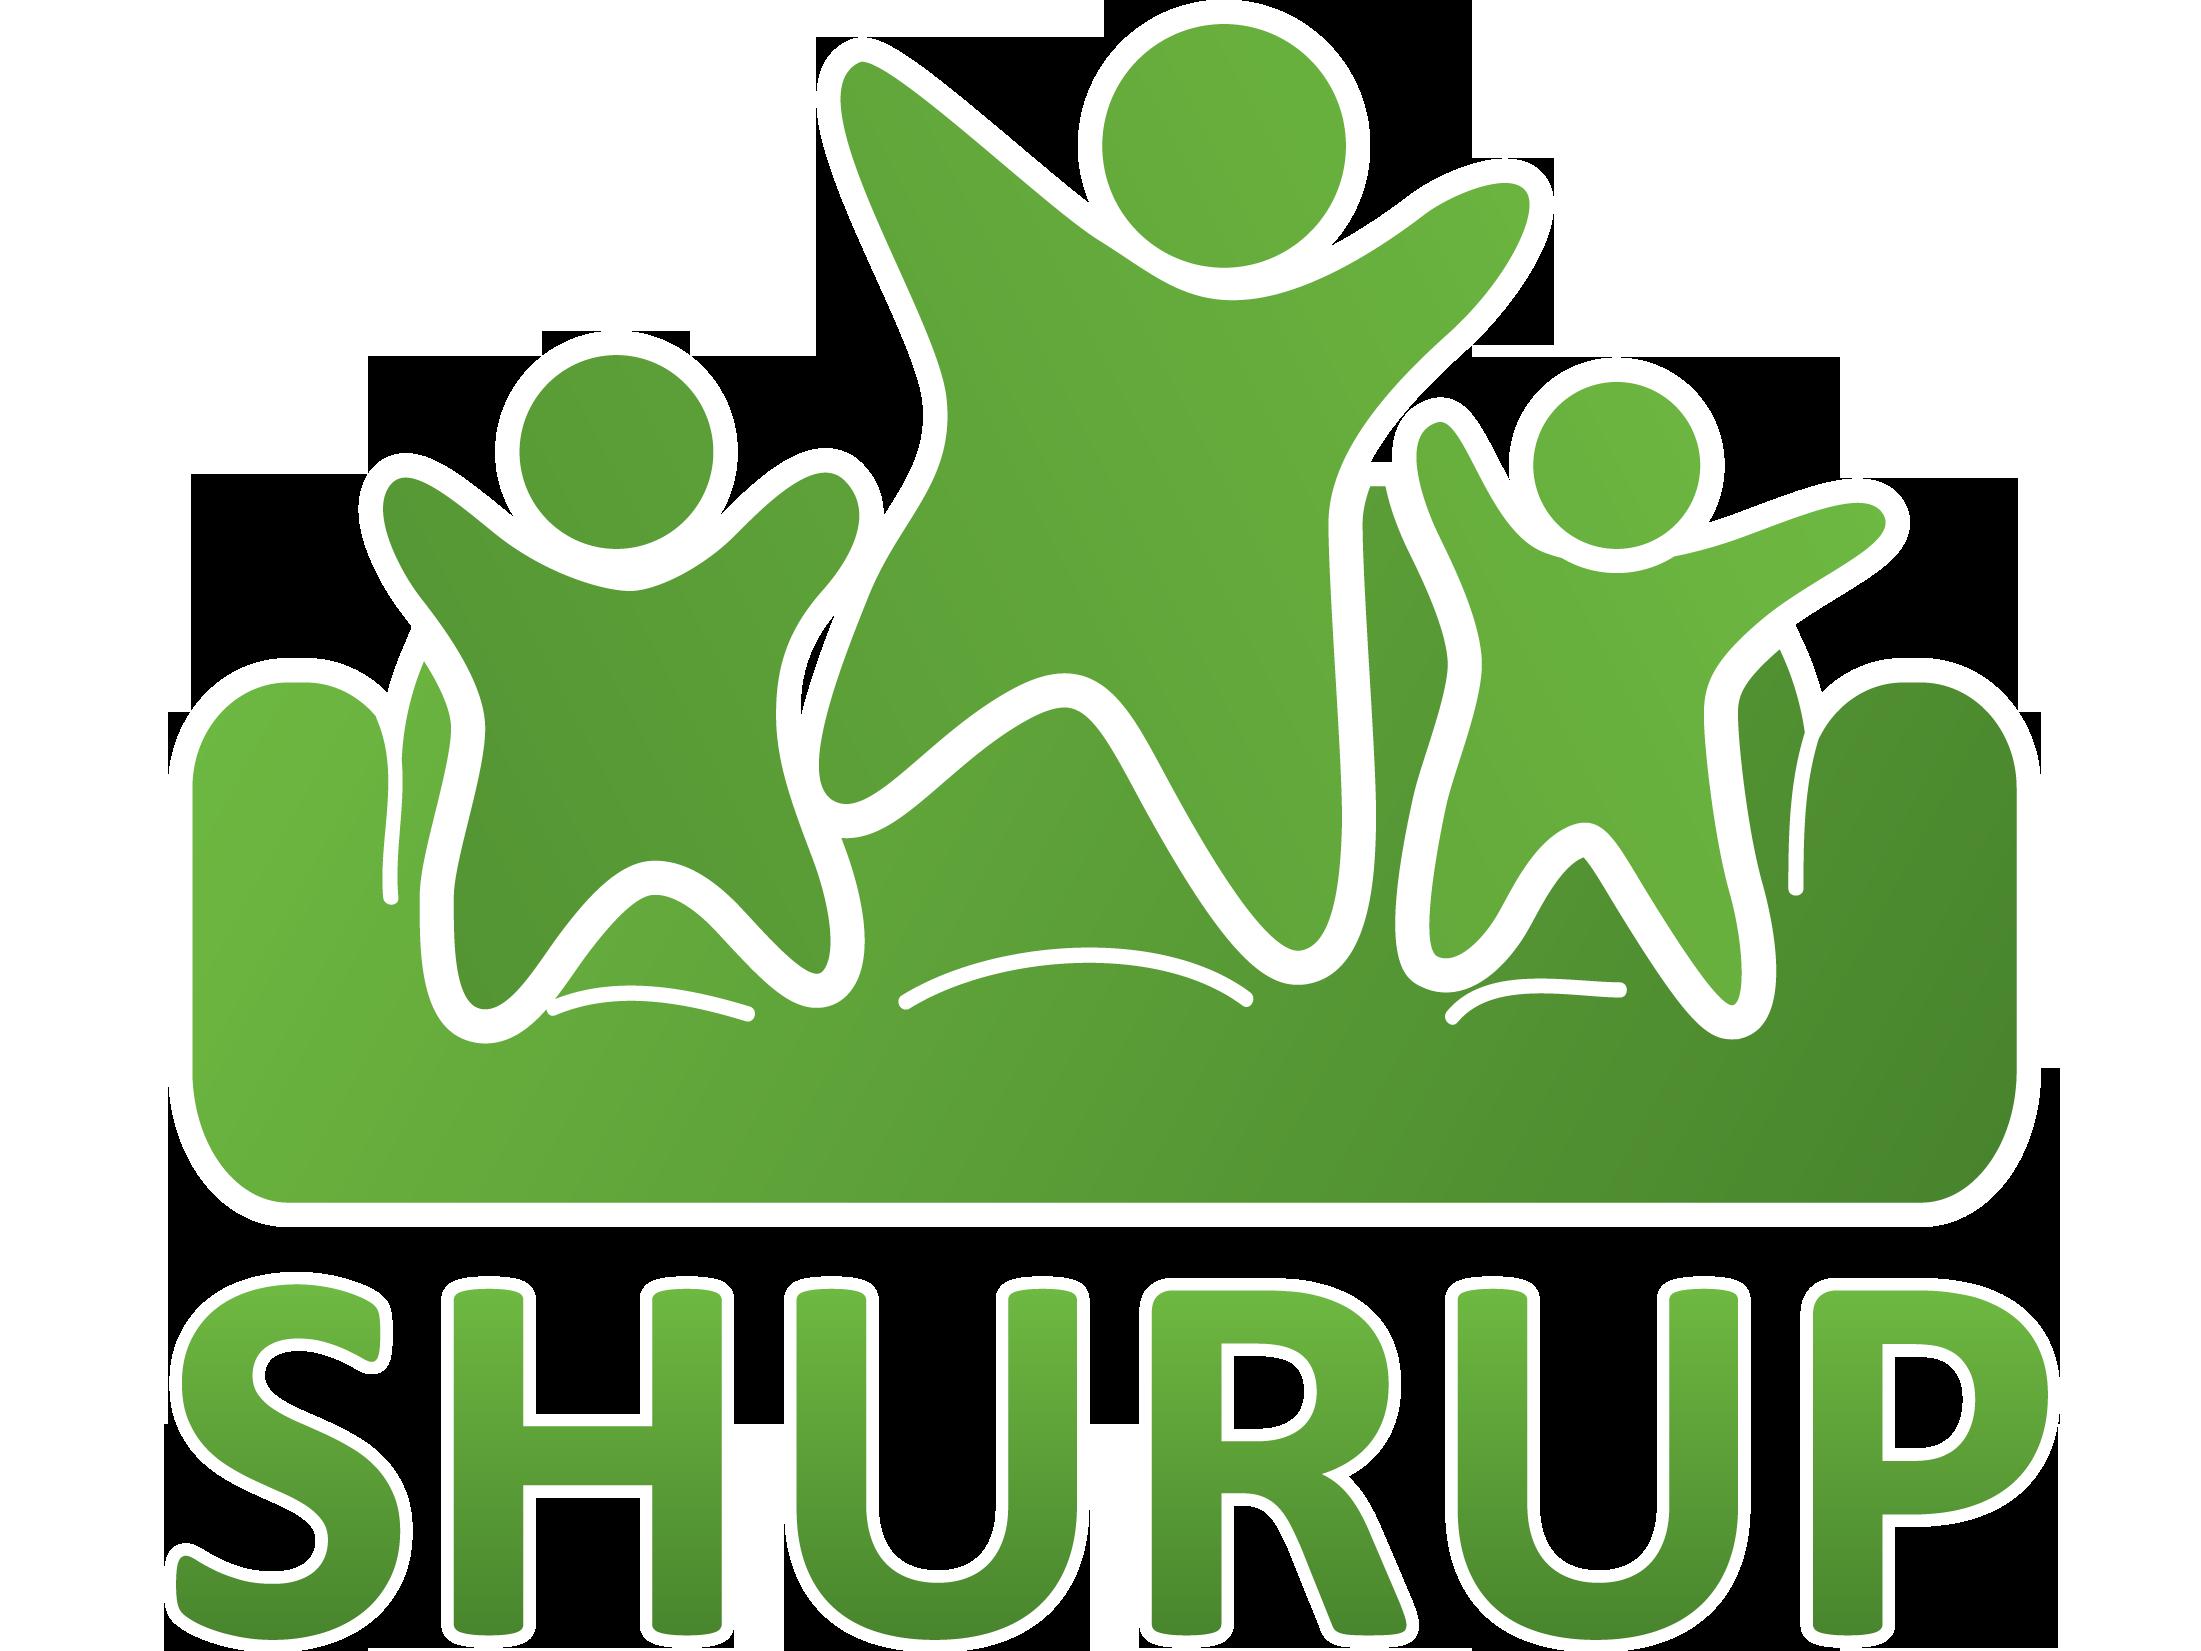 Shurup_logo